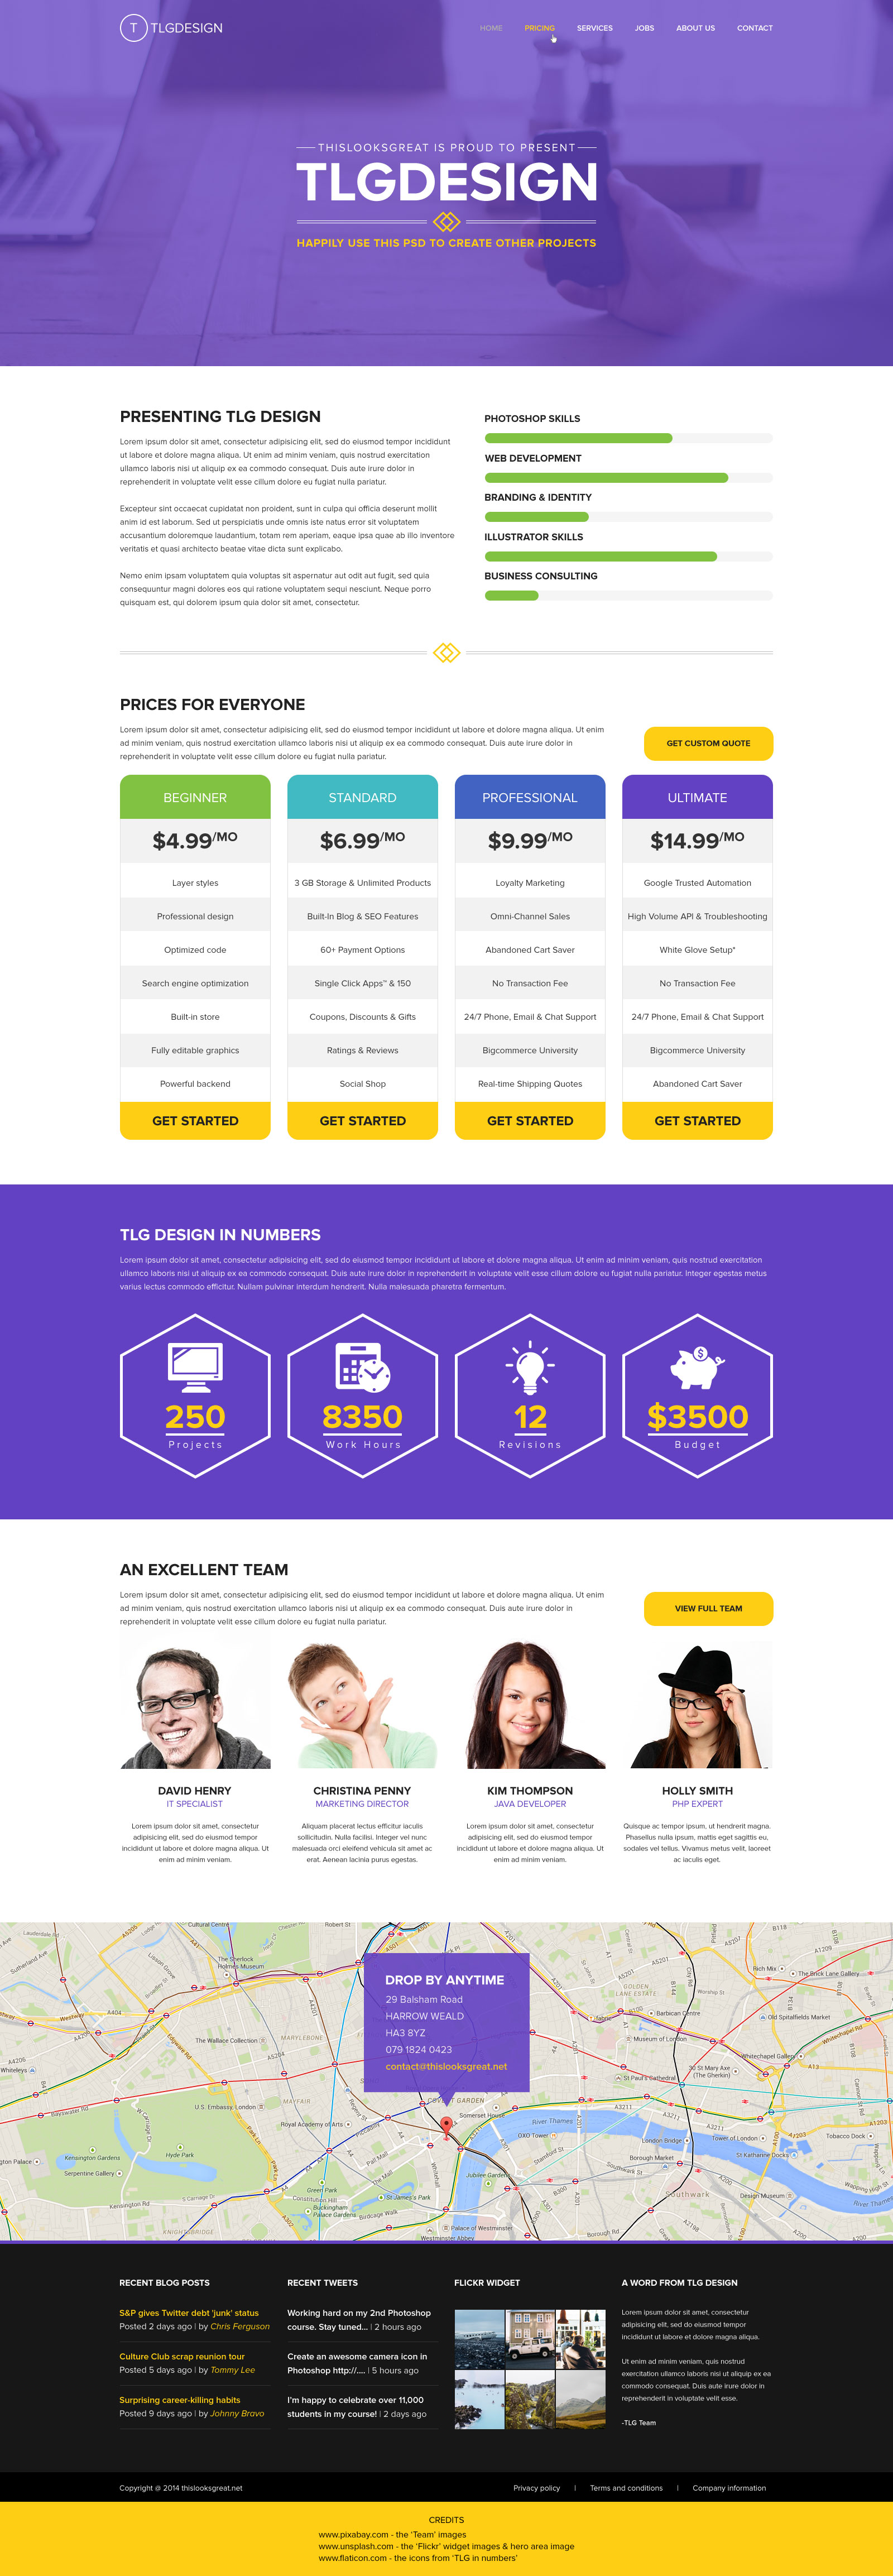 Design Studio Webpage